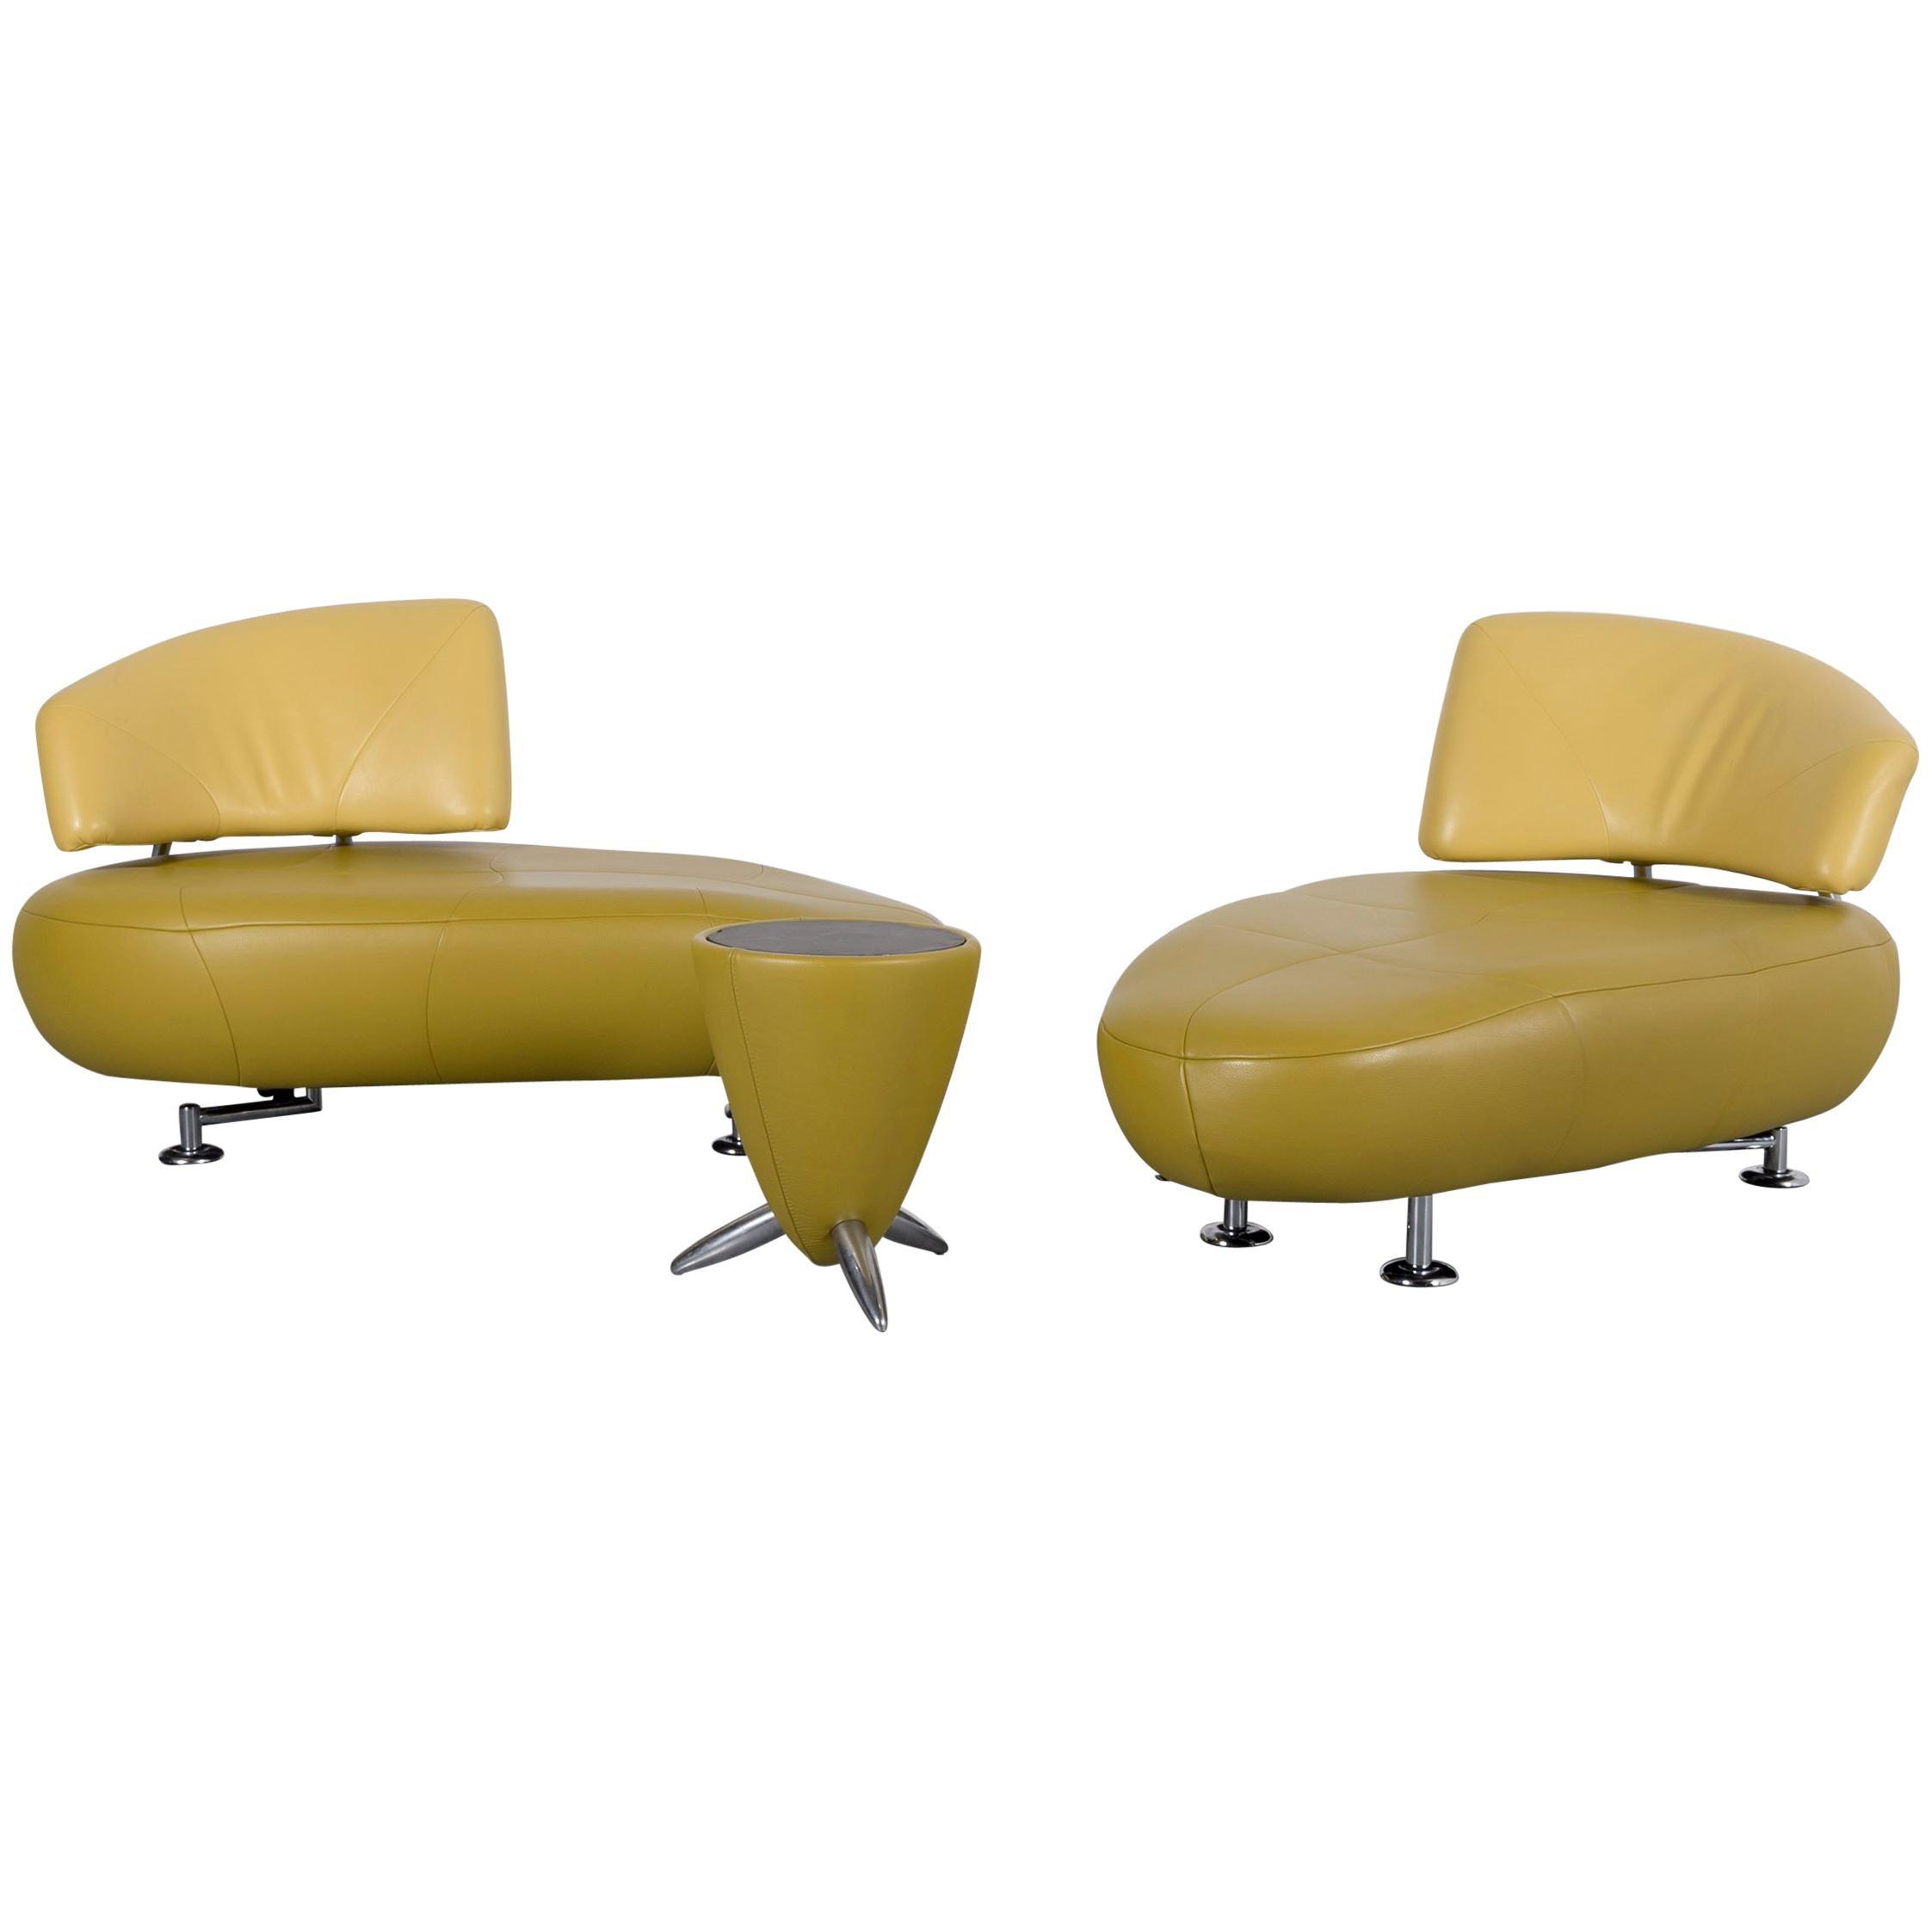 Leolux Kikko Designer Sofa Set Of Two Seat And Bench In Green